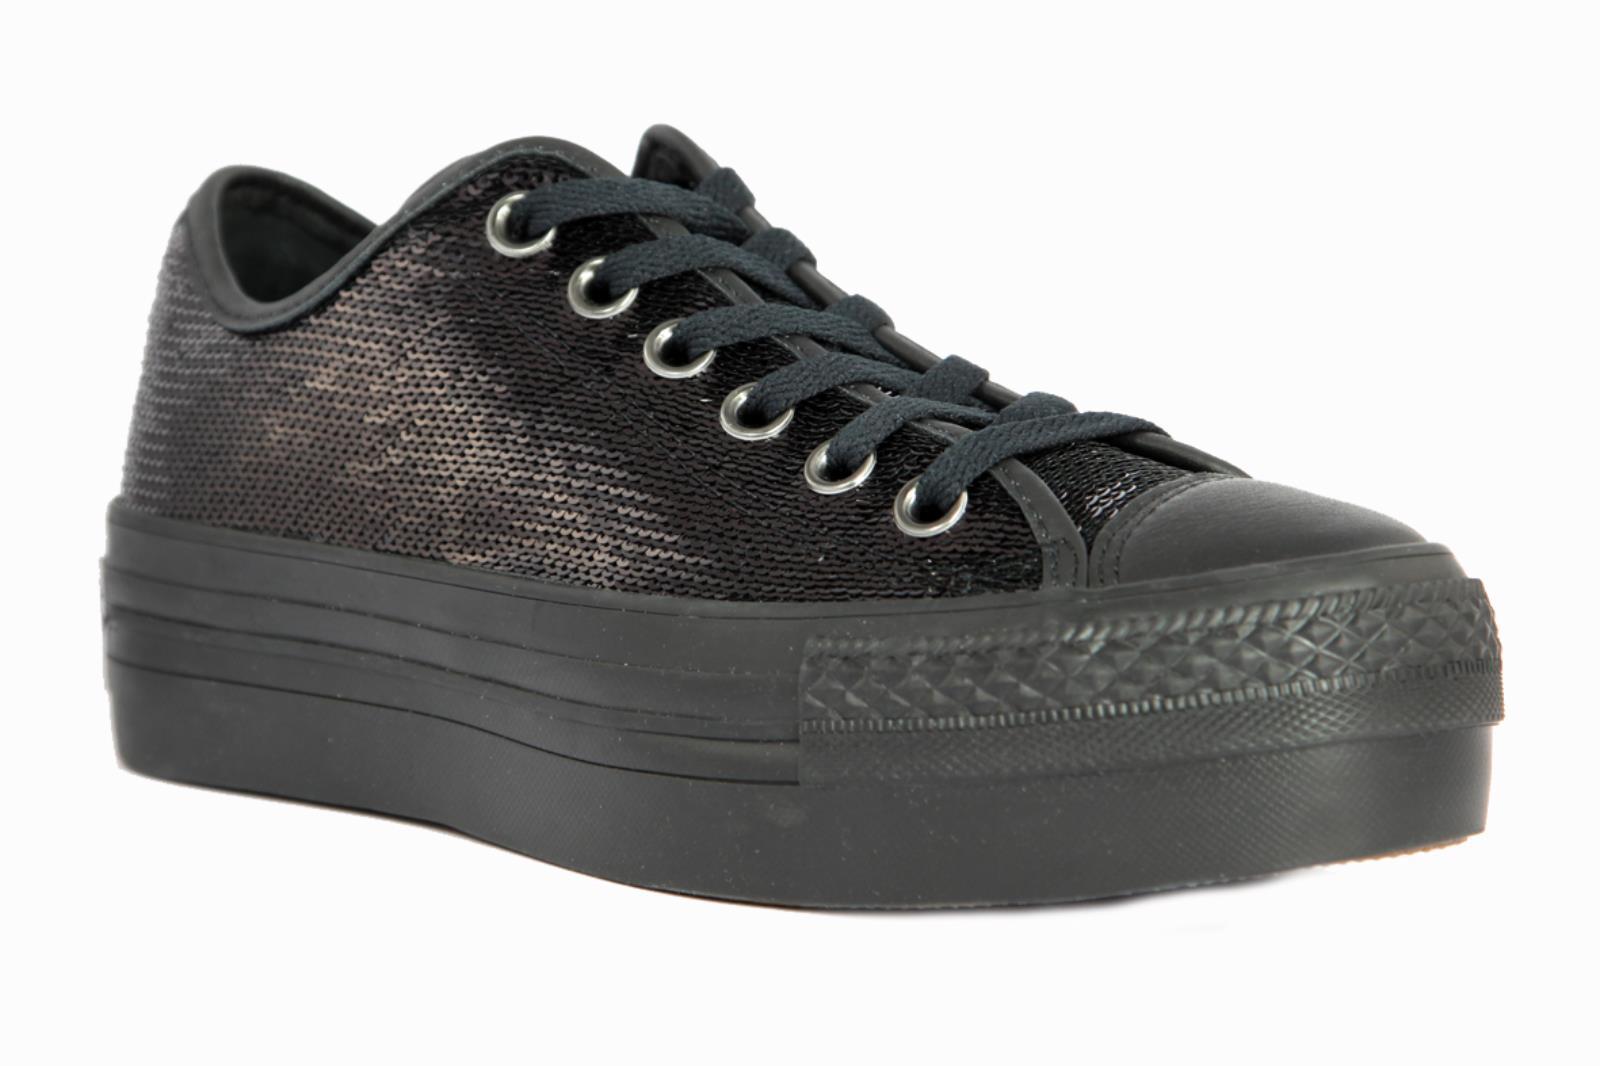 Sneakers Paillettes DONNA  CONVERSE  NERO